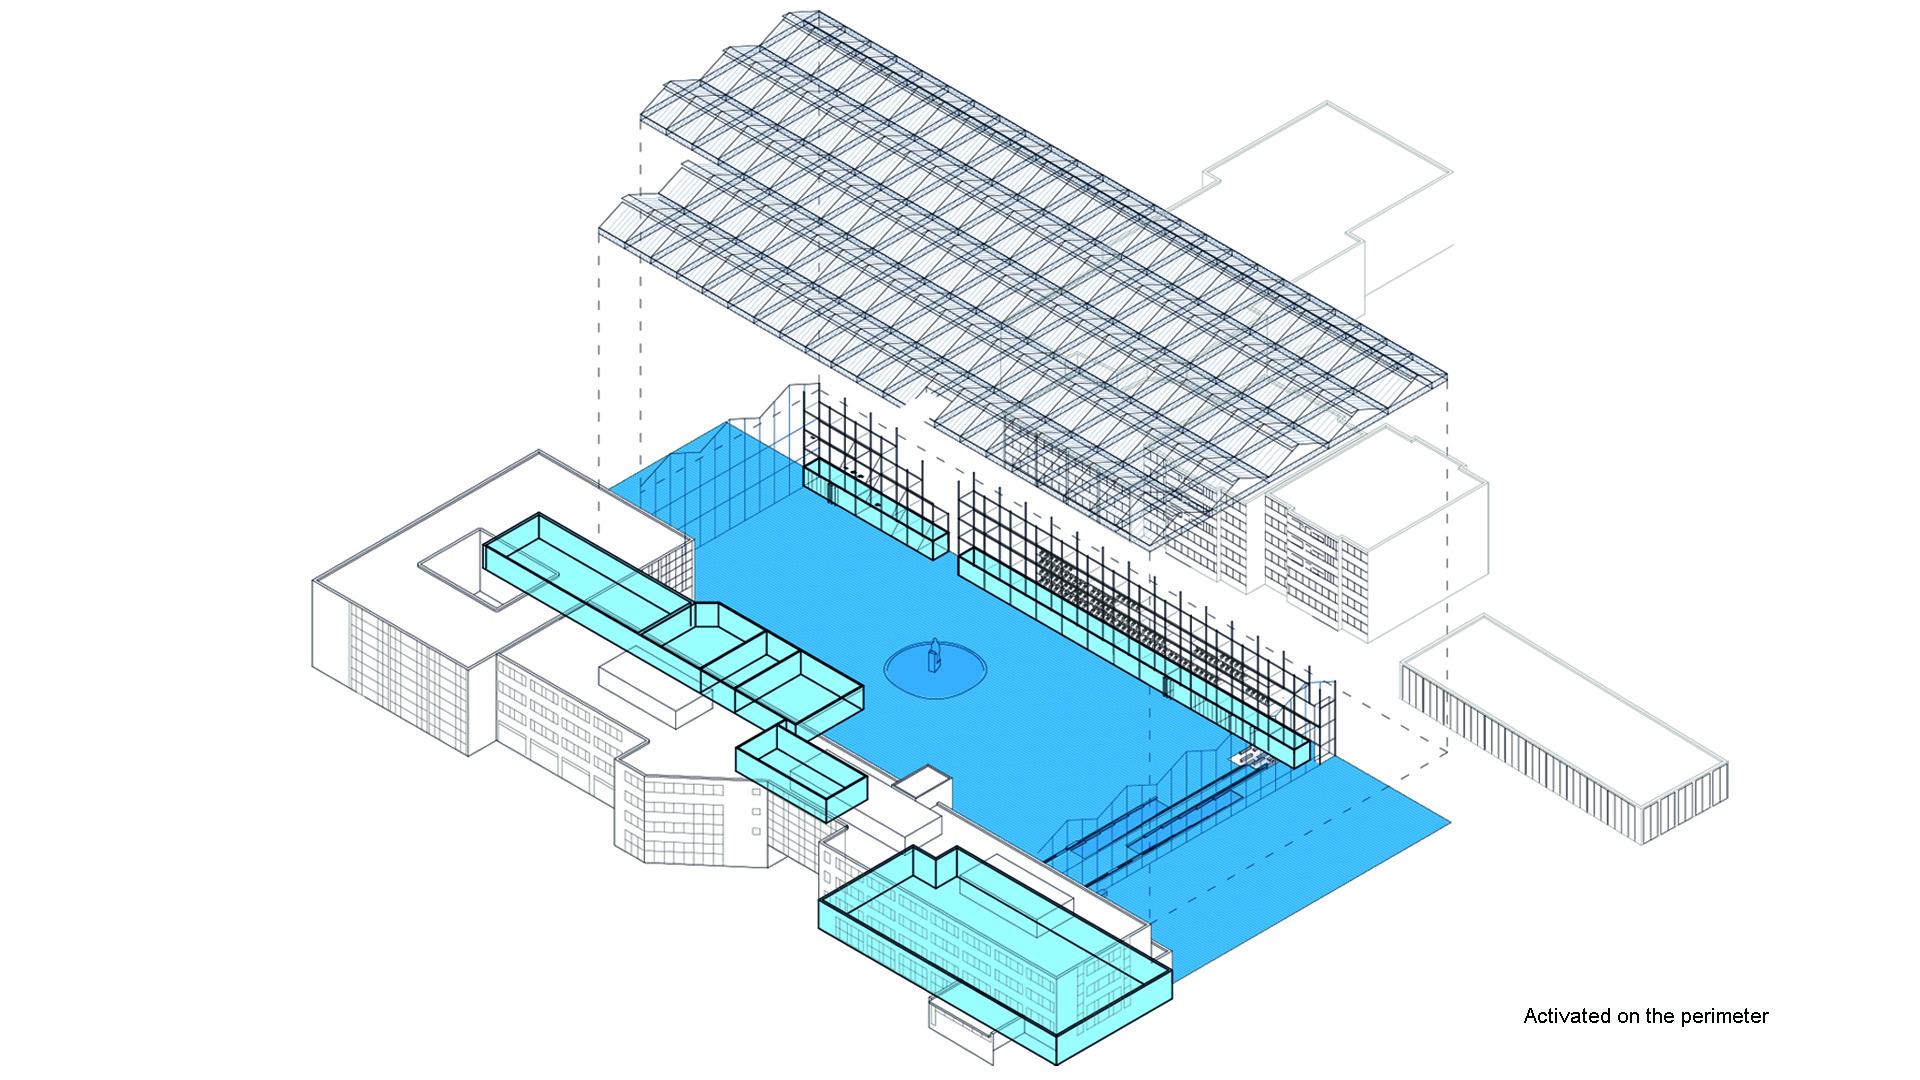 07_furuset diagram